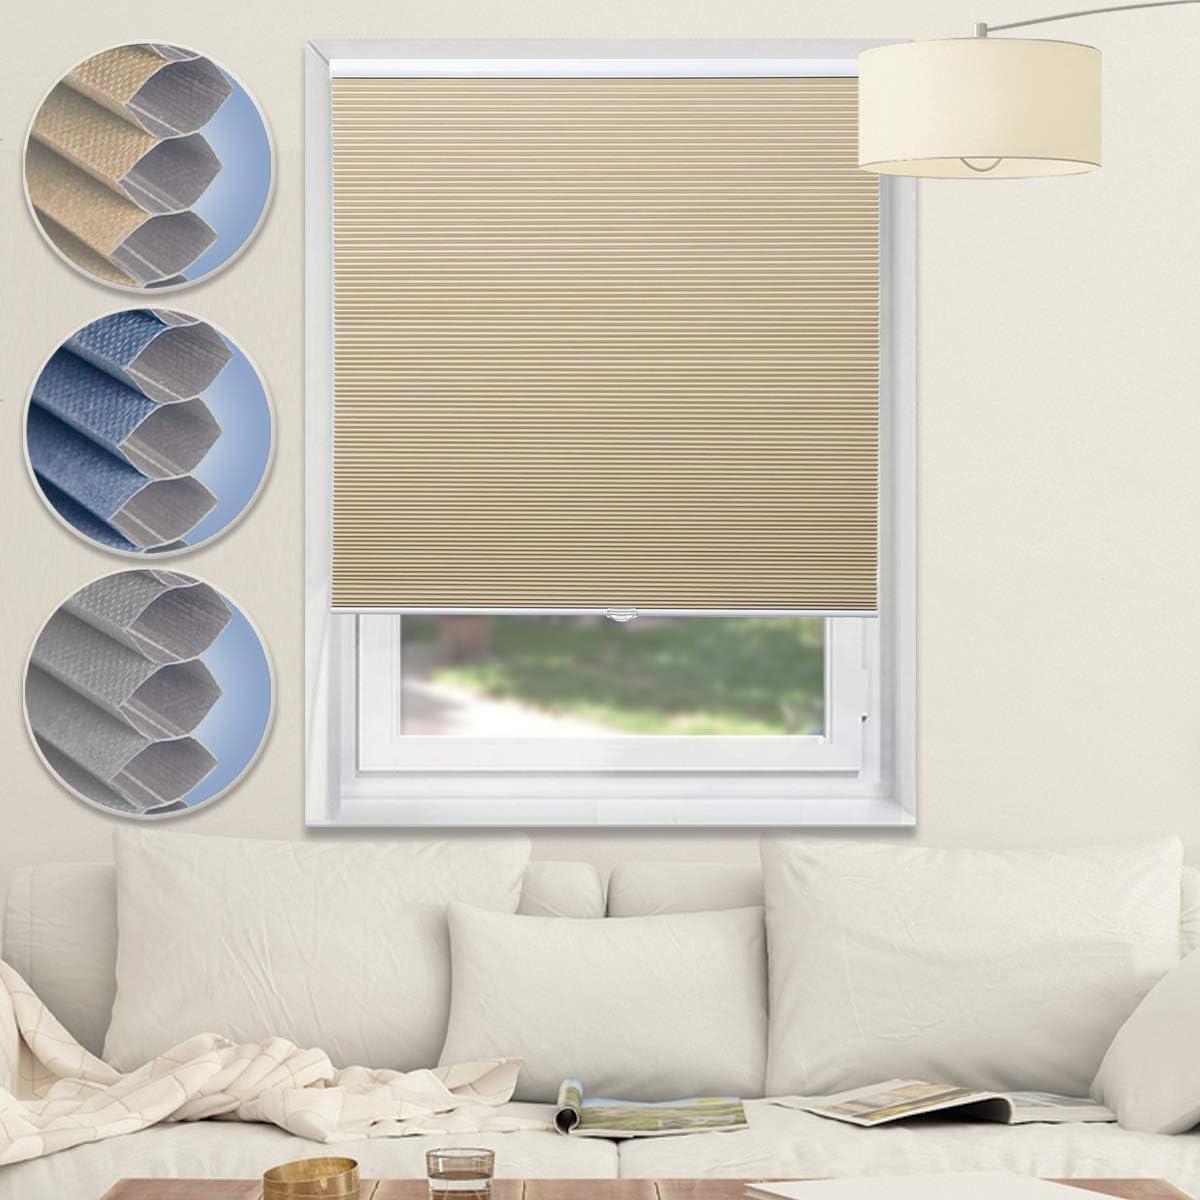 Blackout Blinds San Francisco Mall Cordless Super intense SALE Shades Cellular Window Honeycomb